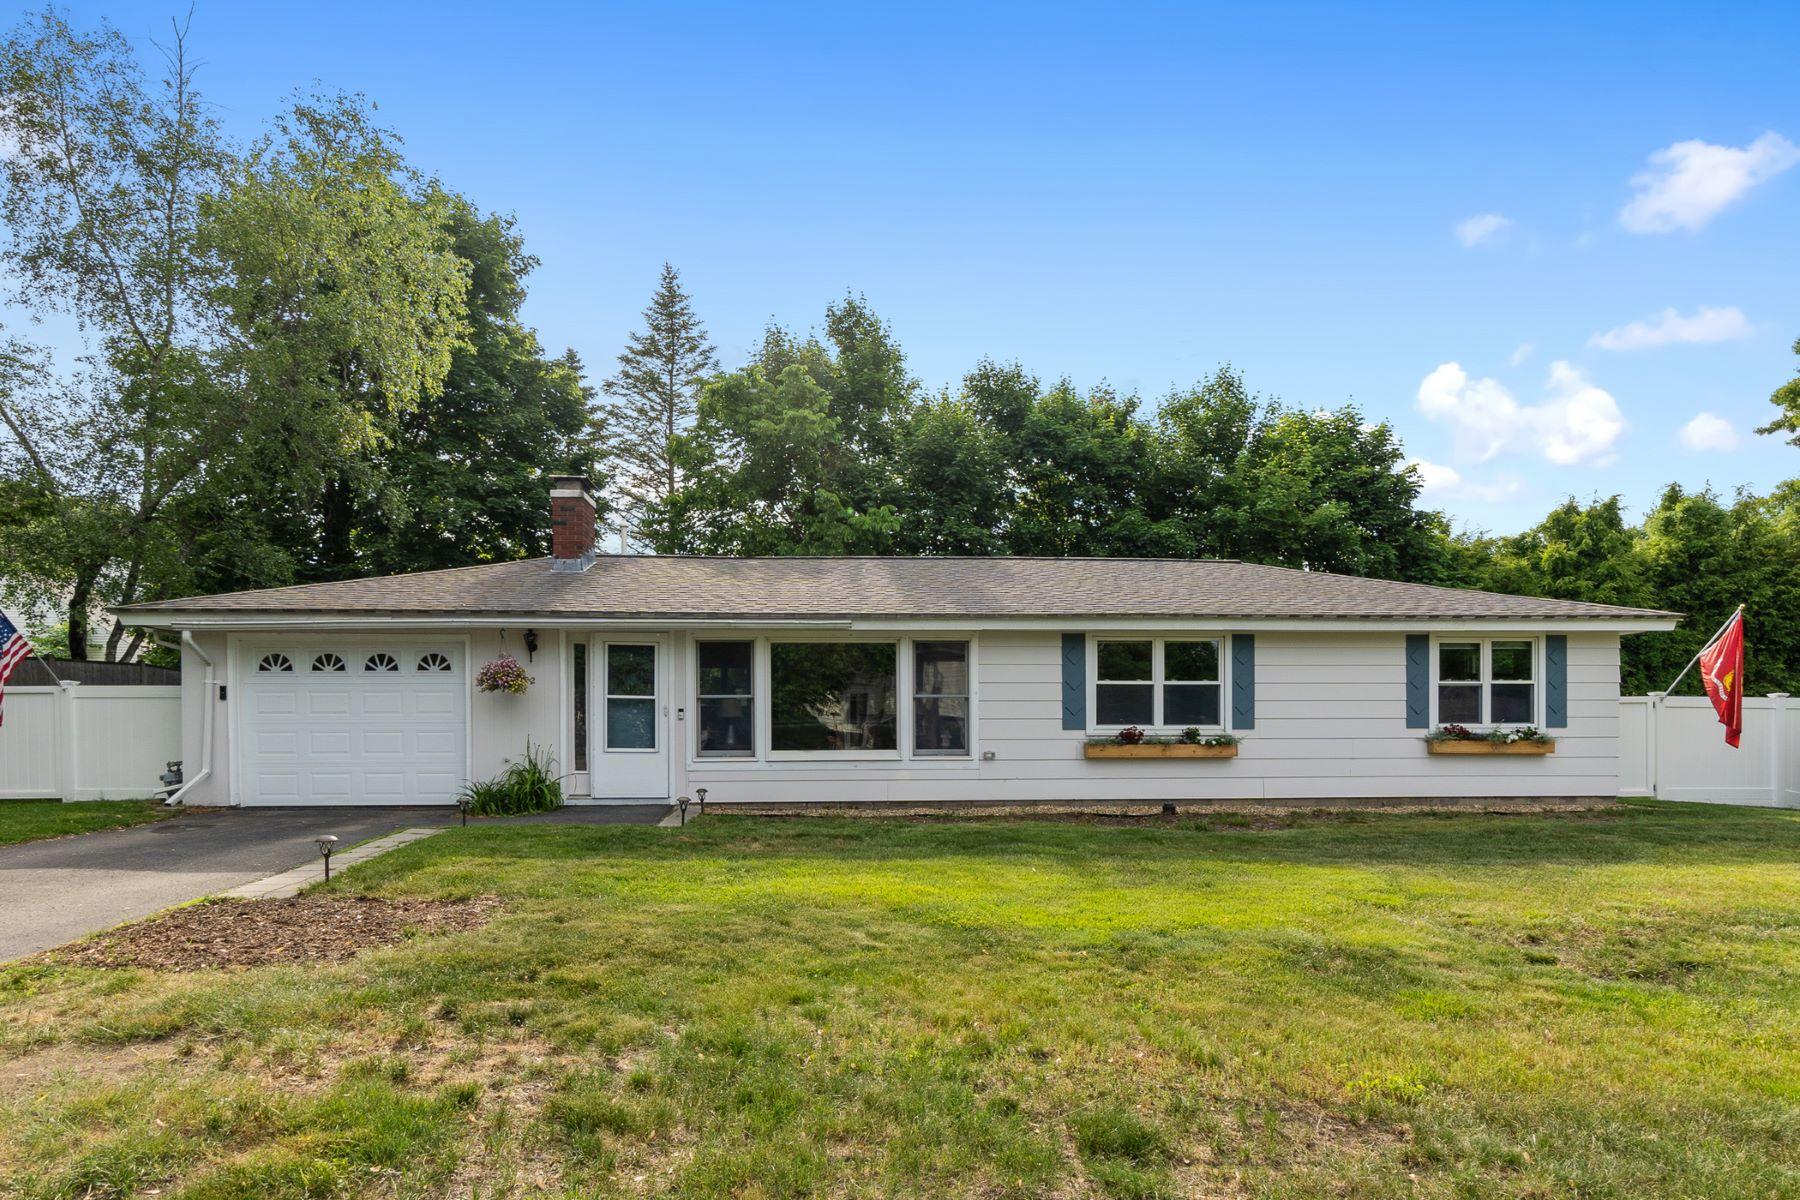 Single Family Homes for Active at 2 Durant Ave Maynard, Massachusetts 01754 United States